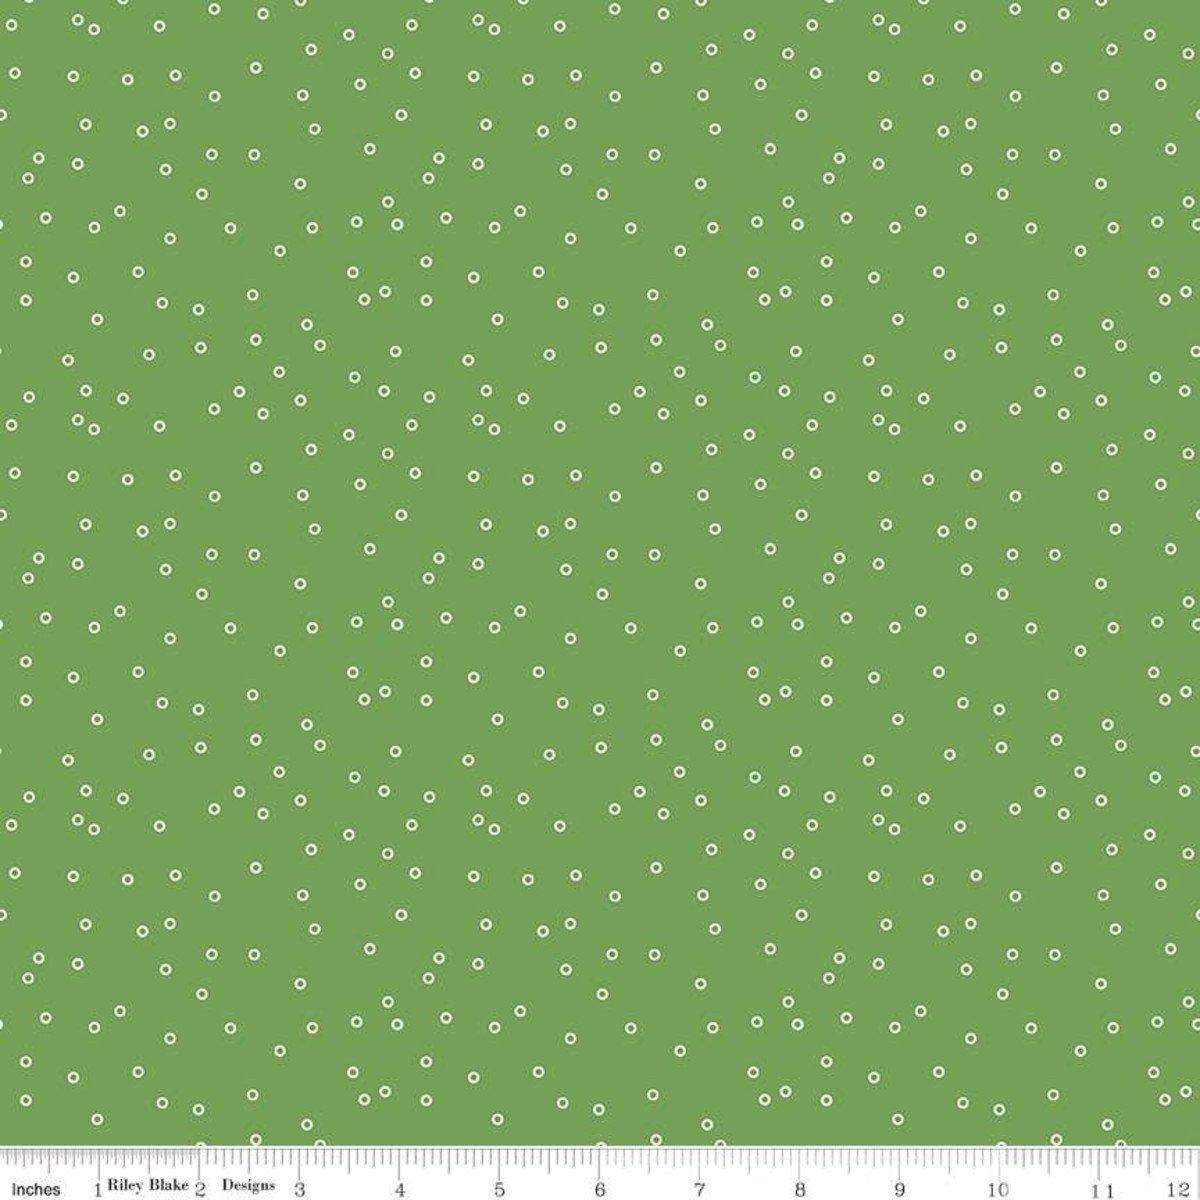 Prim C9693 Circles Clover by Lori Holt for Riley Blake Designs